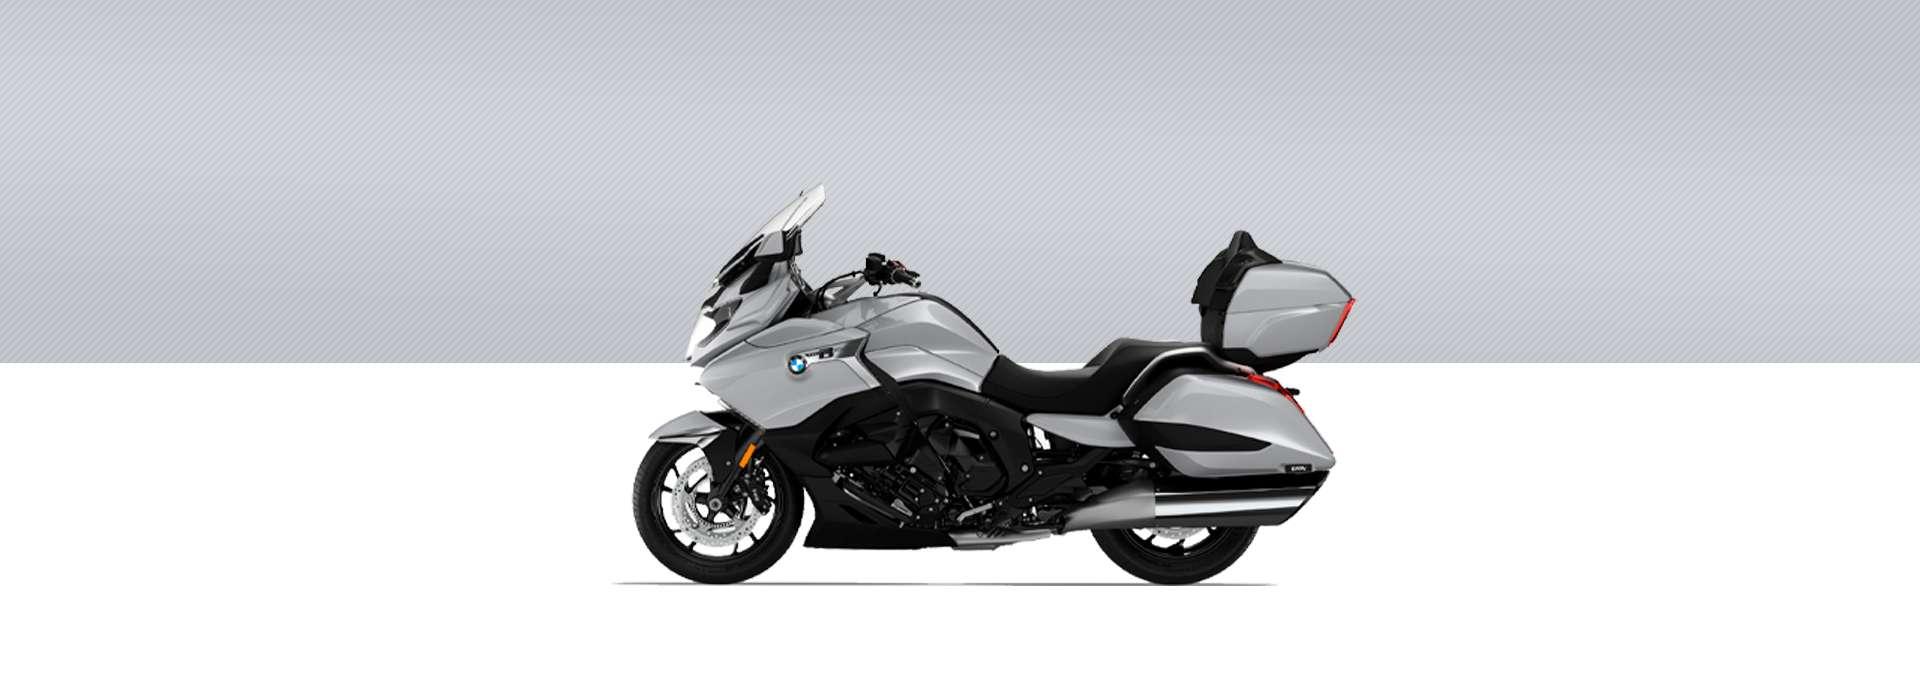 BMW Motorrad BMW K 1600 Grand America